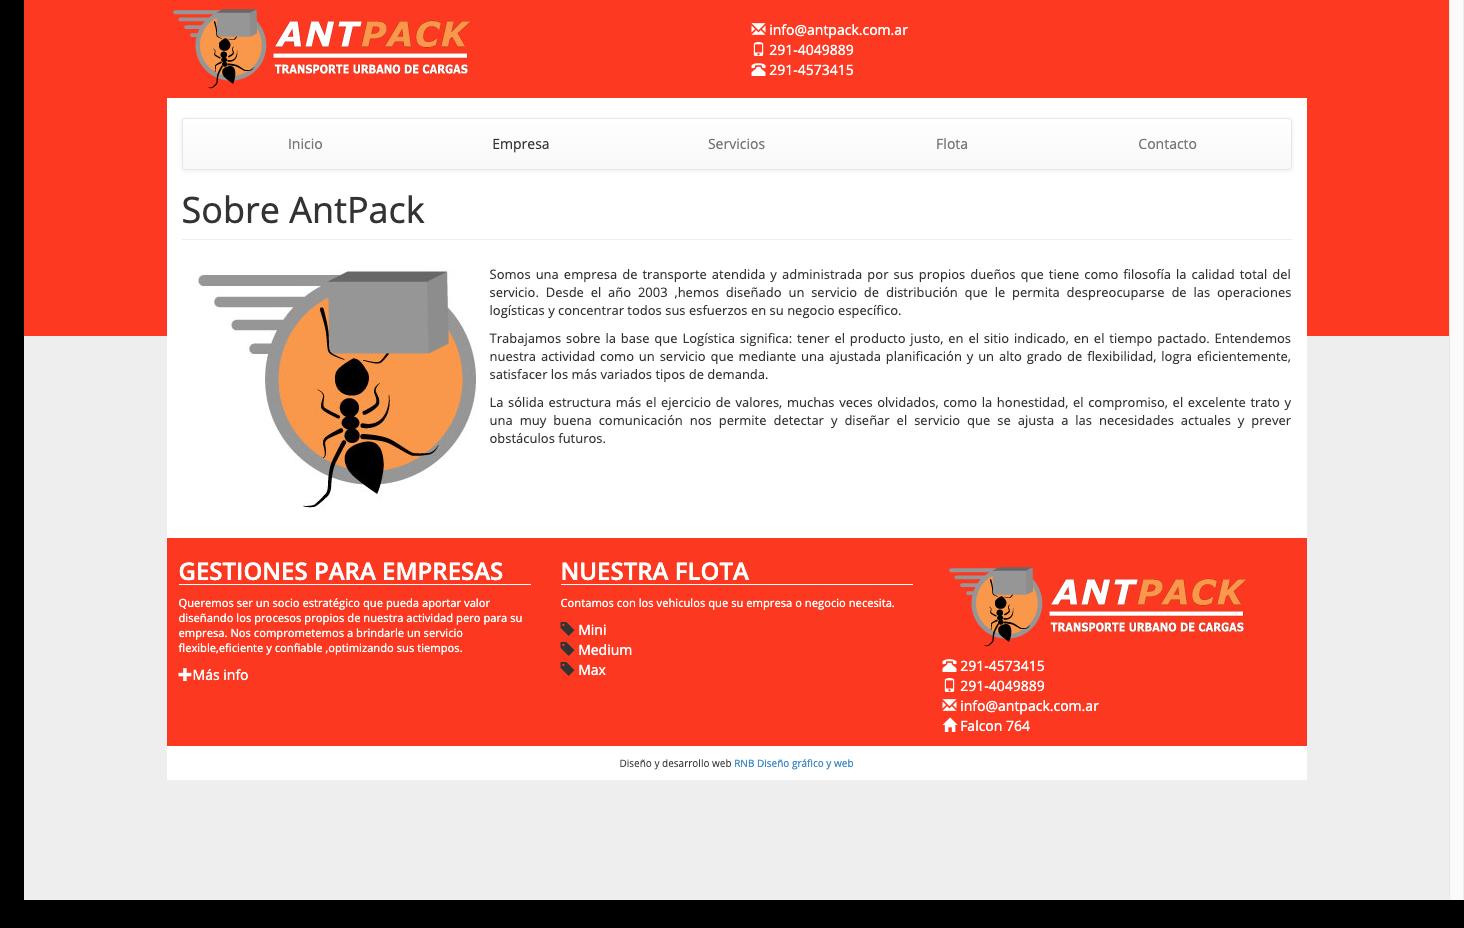 Antpack